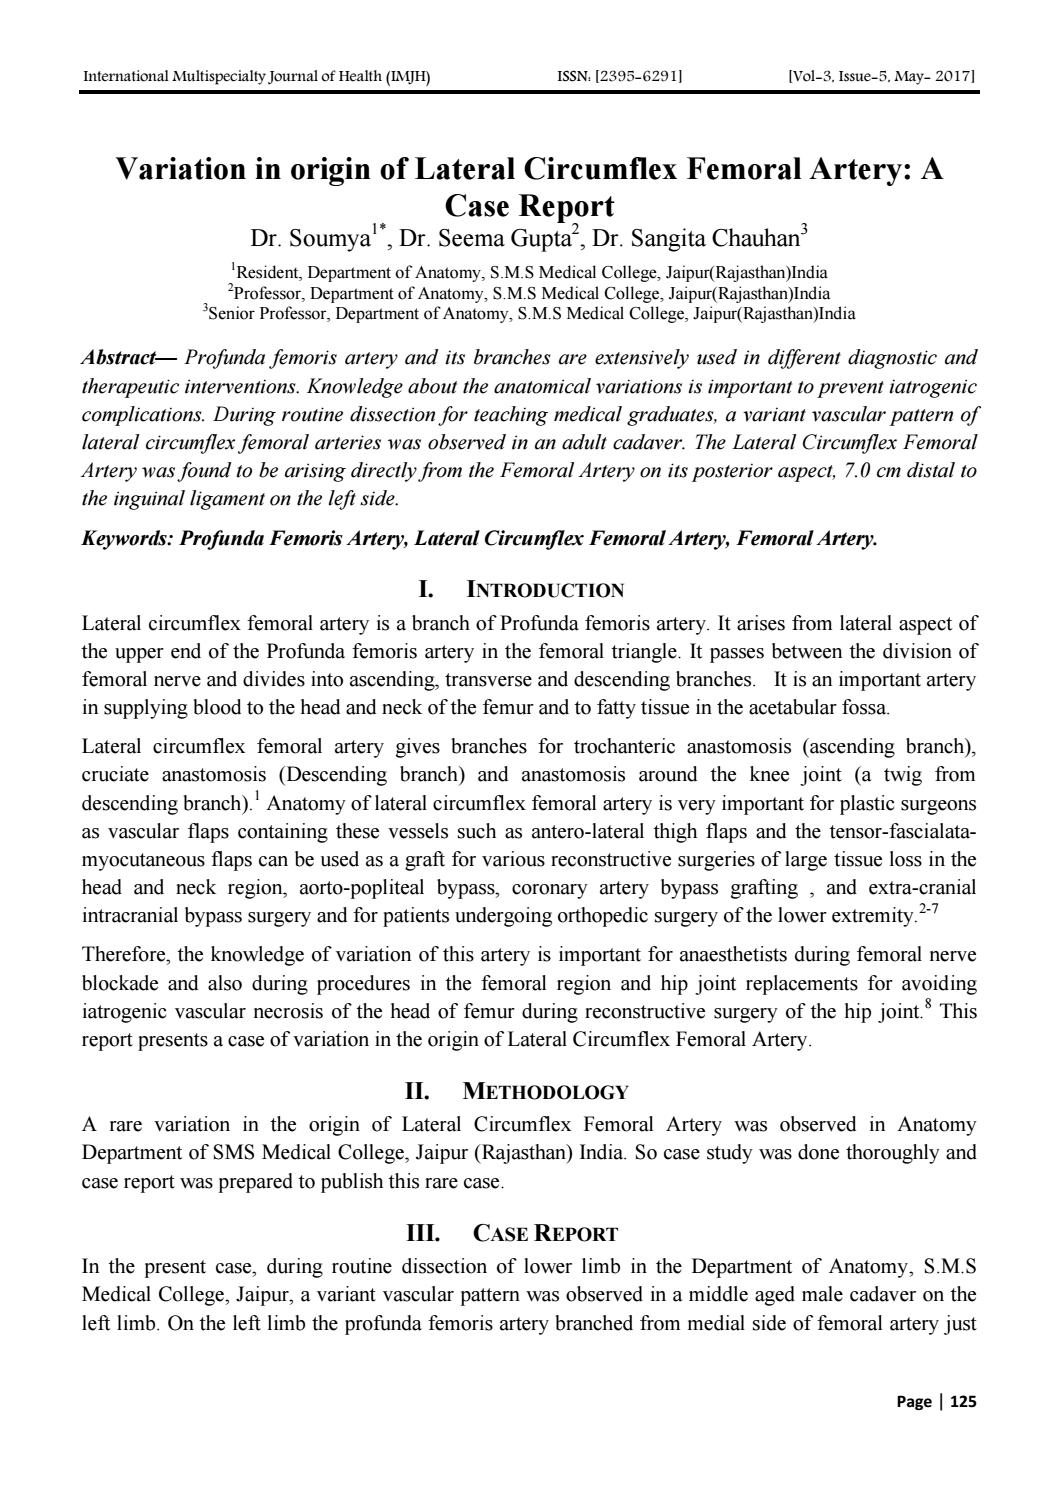 Variation in origin of Lateral Circumflex Femoral Artery: A Case ...